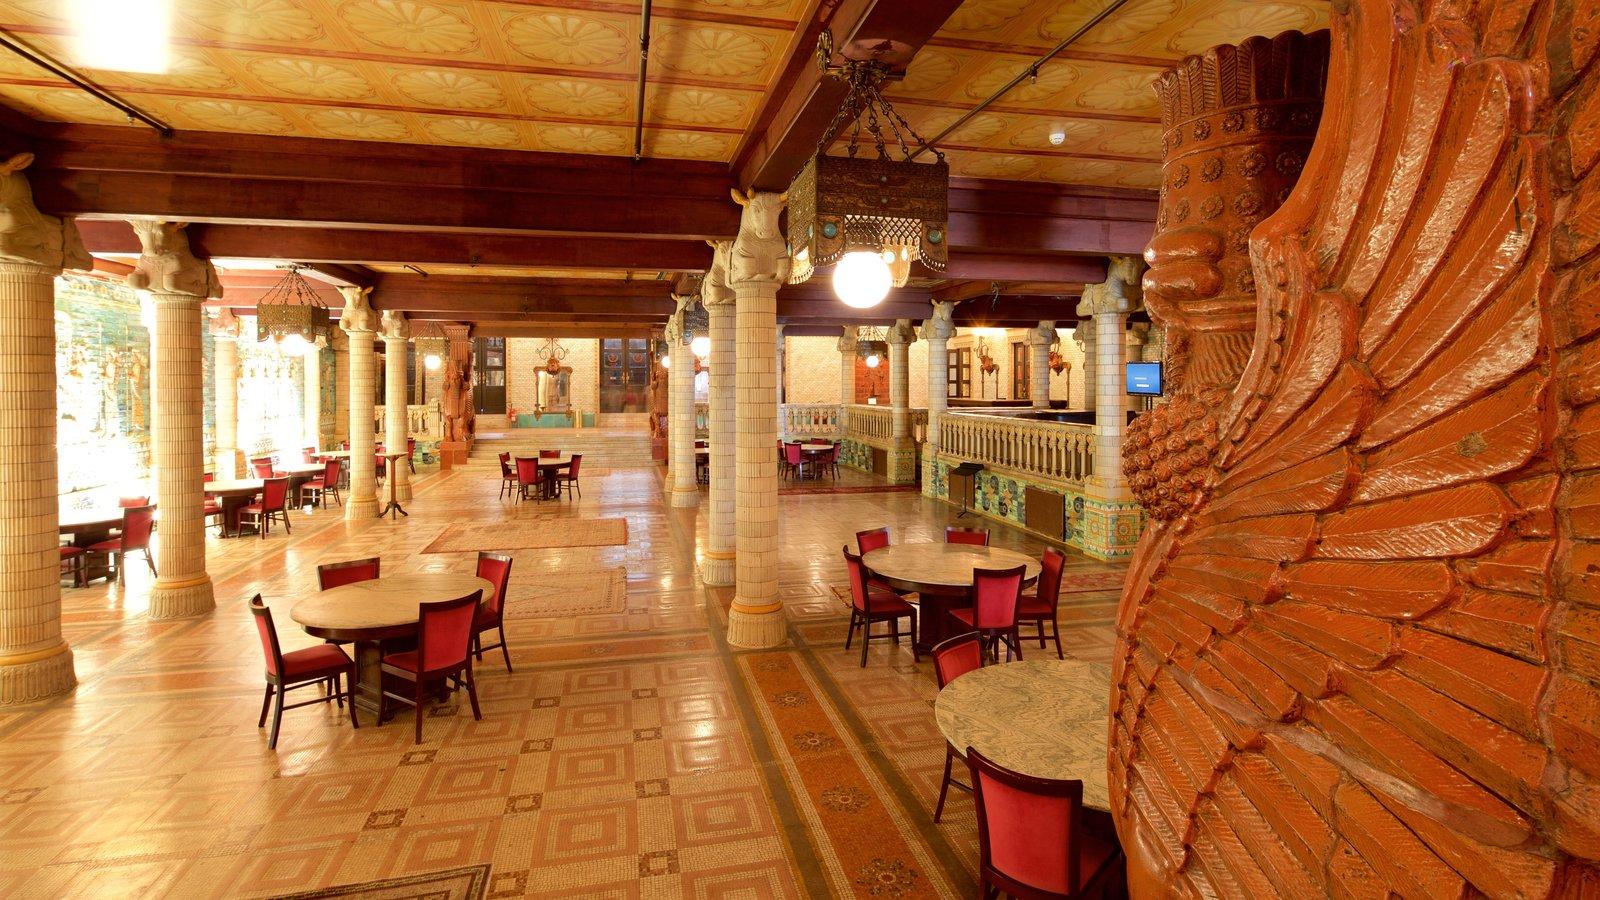 Teatro Municipal que inclui vistas internas e elementos de patrimônio